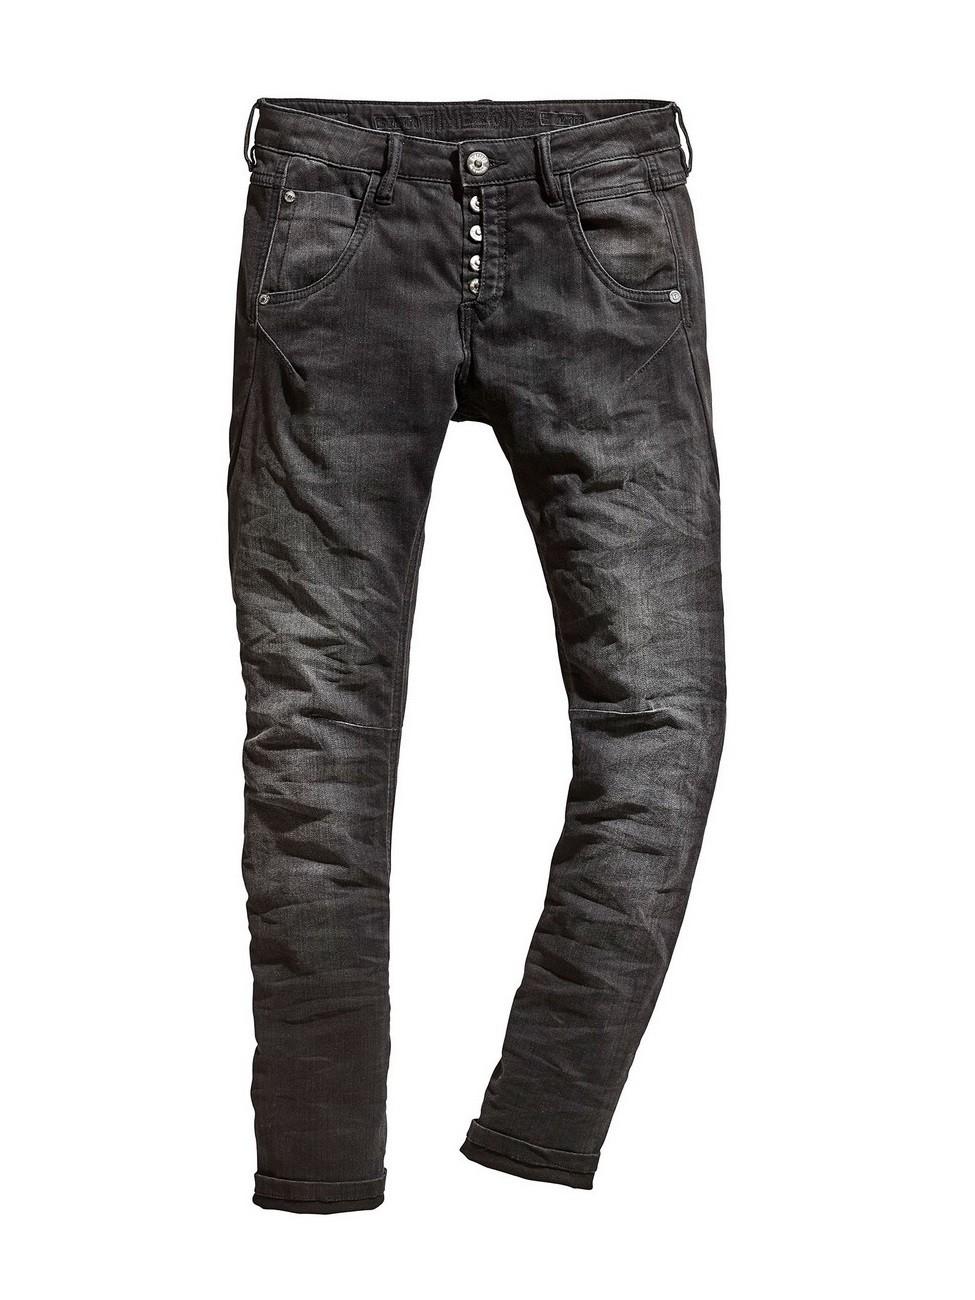 Timezone Damen Jeans RivaTZ - Slim Fit  - Schwarz - Black Soft Wash